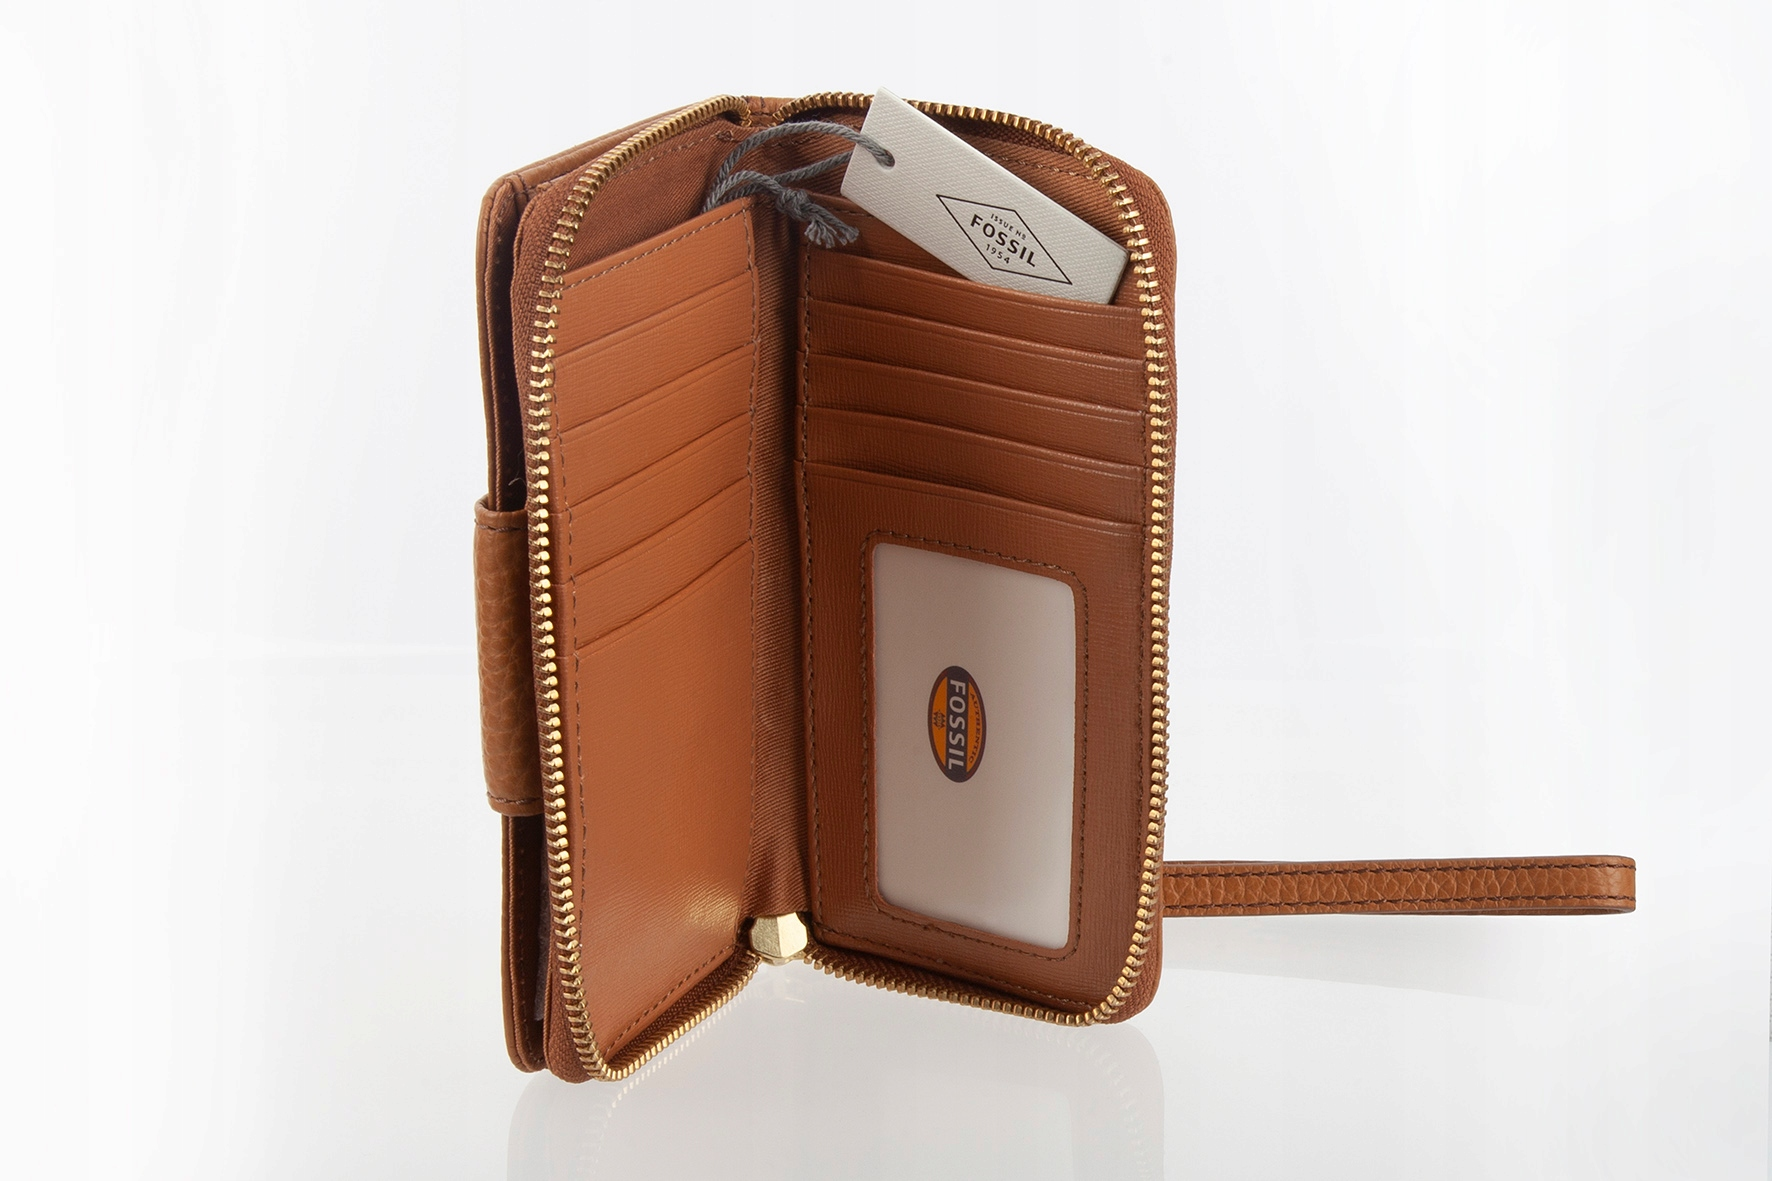 b6dc93ee1ec43 portfel damski FOSSIL brąz /saddle skóra Premium - 7641684262 ...